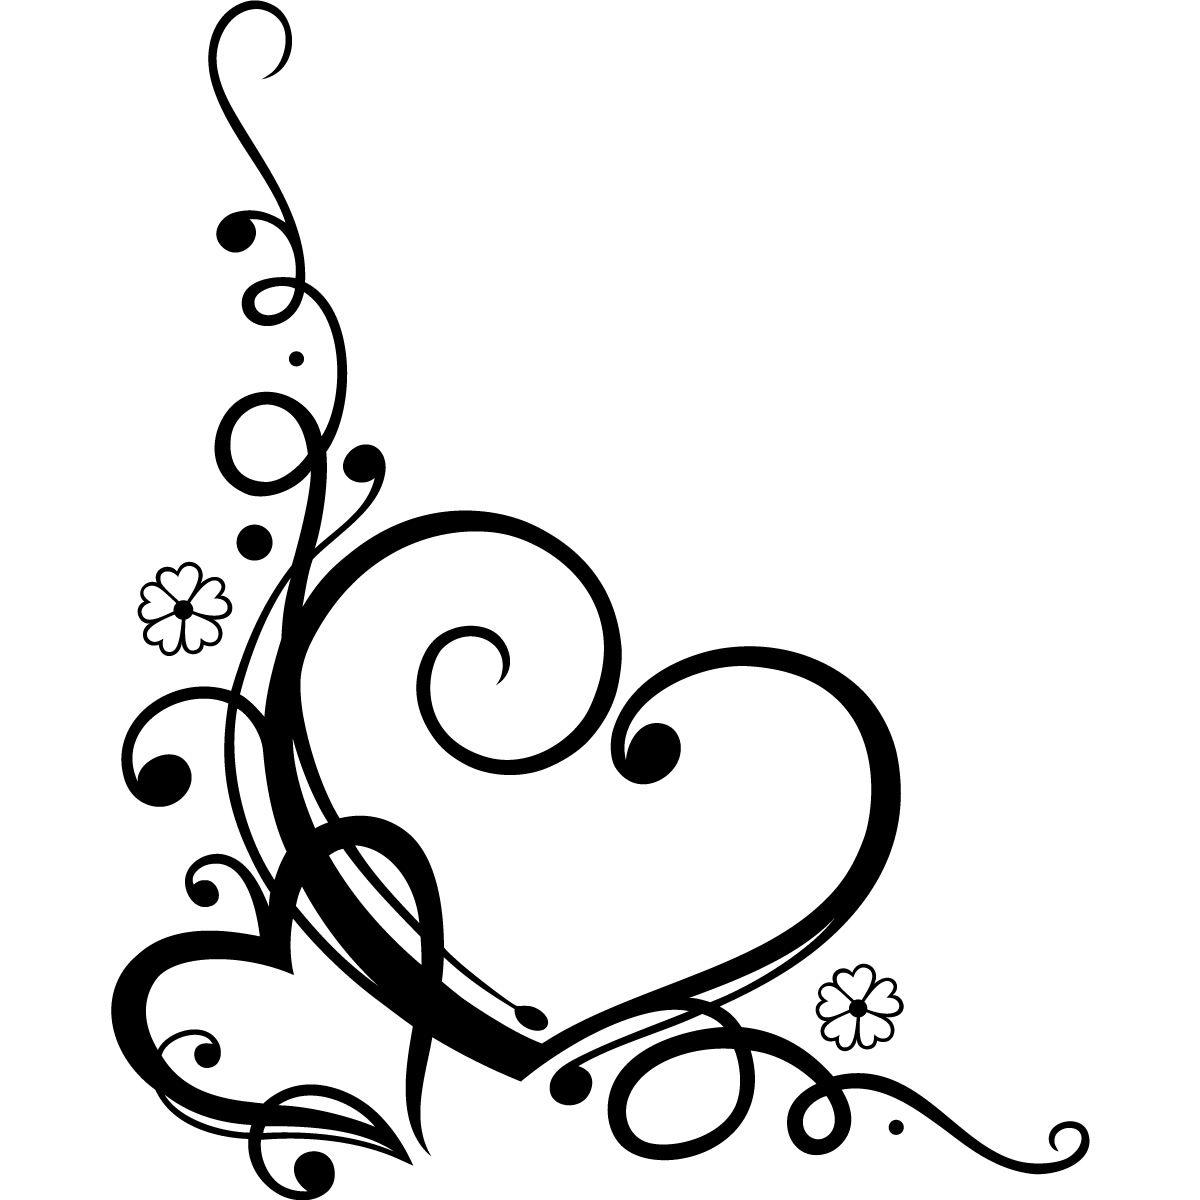 Decorative Love Heart Floral Wall Art Sticker Wall Decal Transfers